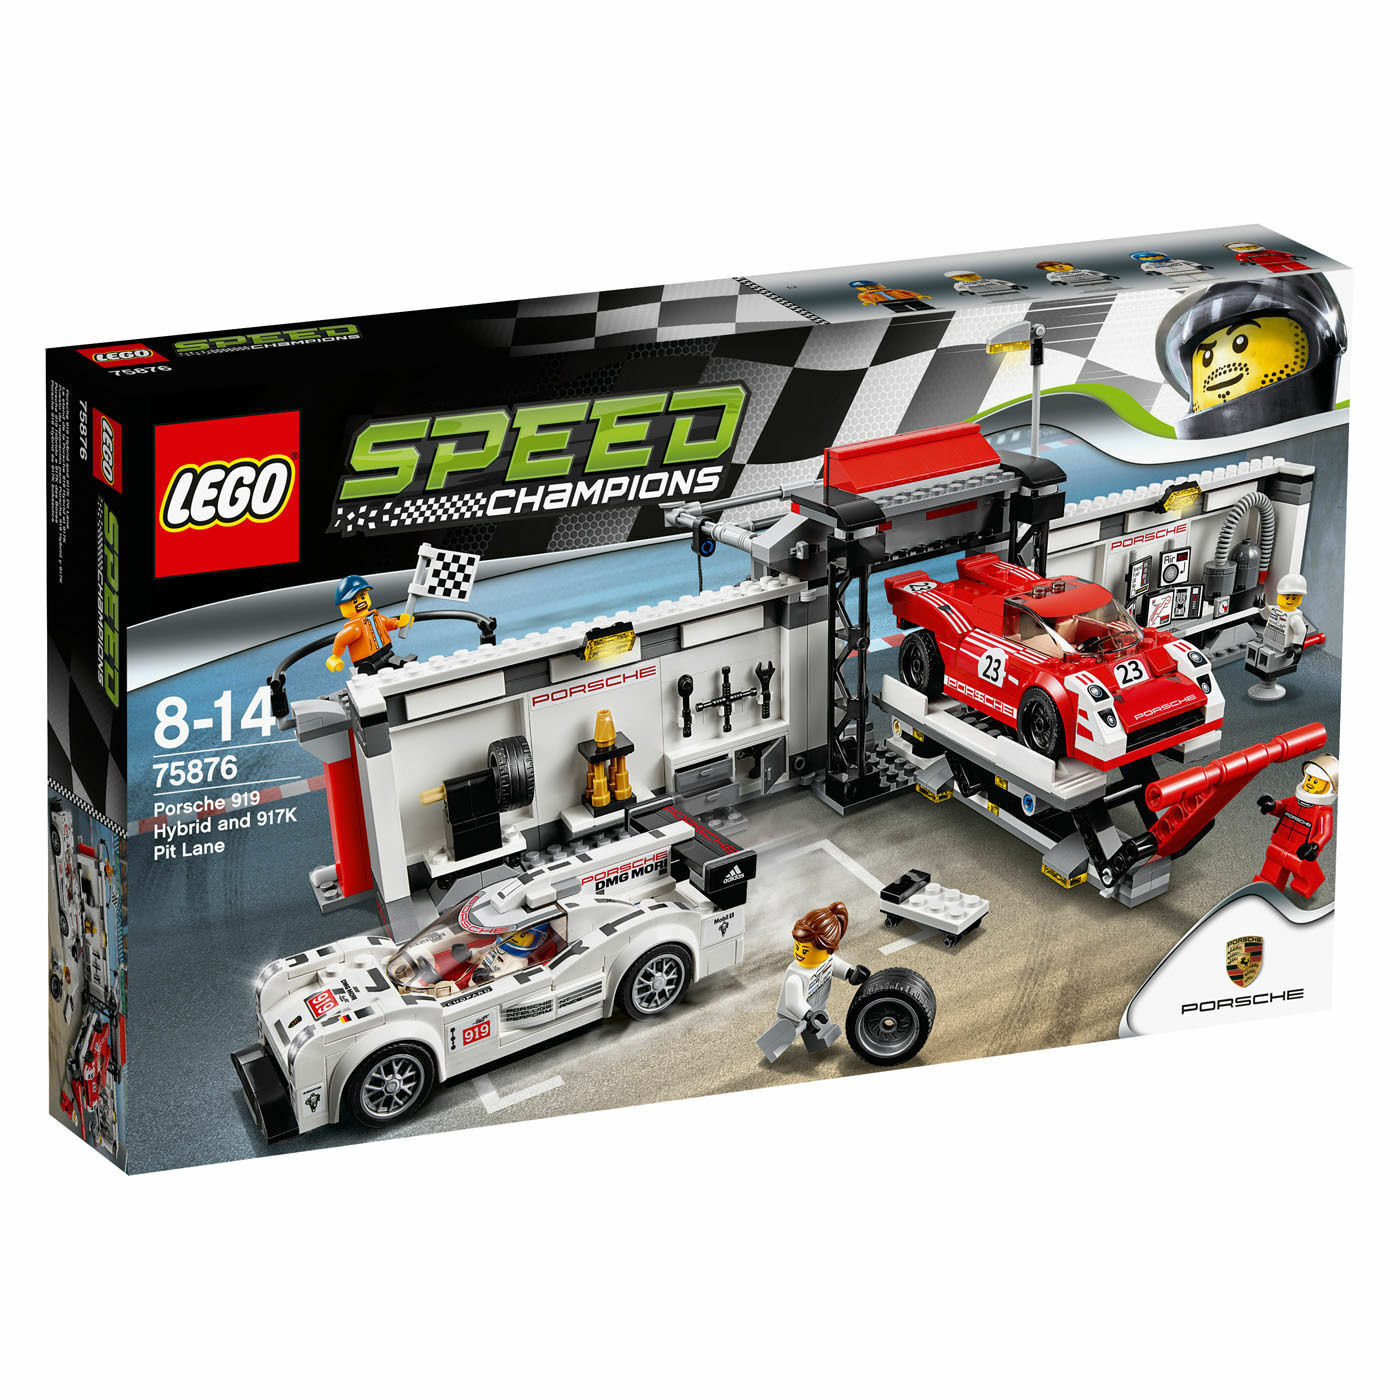 75876 LEGO Porsche 919 Hybrid & 917K Pit Lane Speed Champions BRAND NEW RETIRED